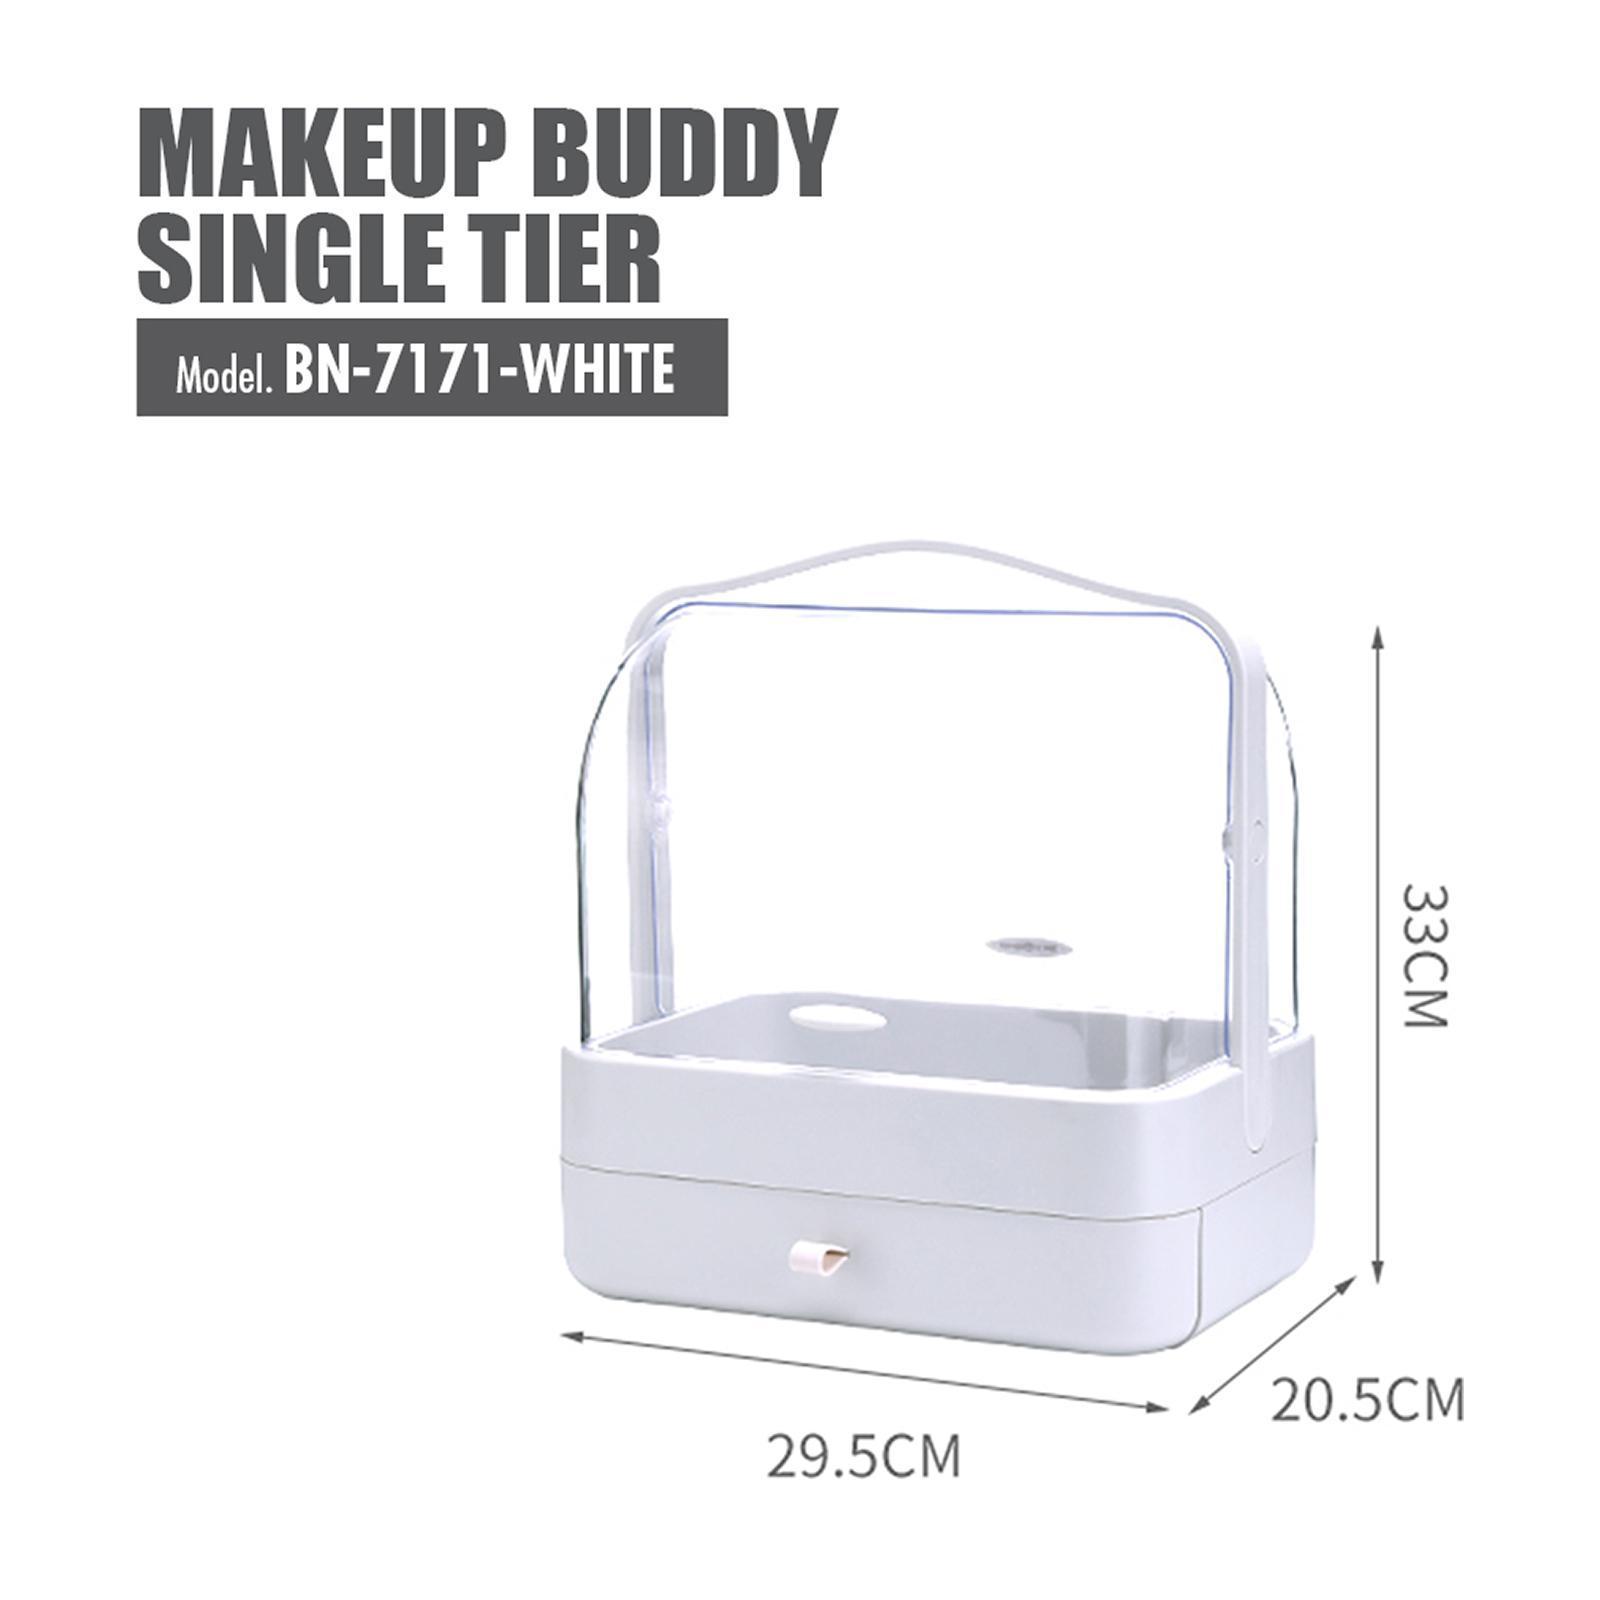 HOUZE Make Up Buddy (Single Tier)